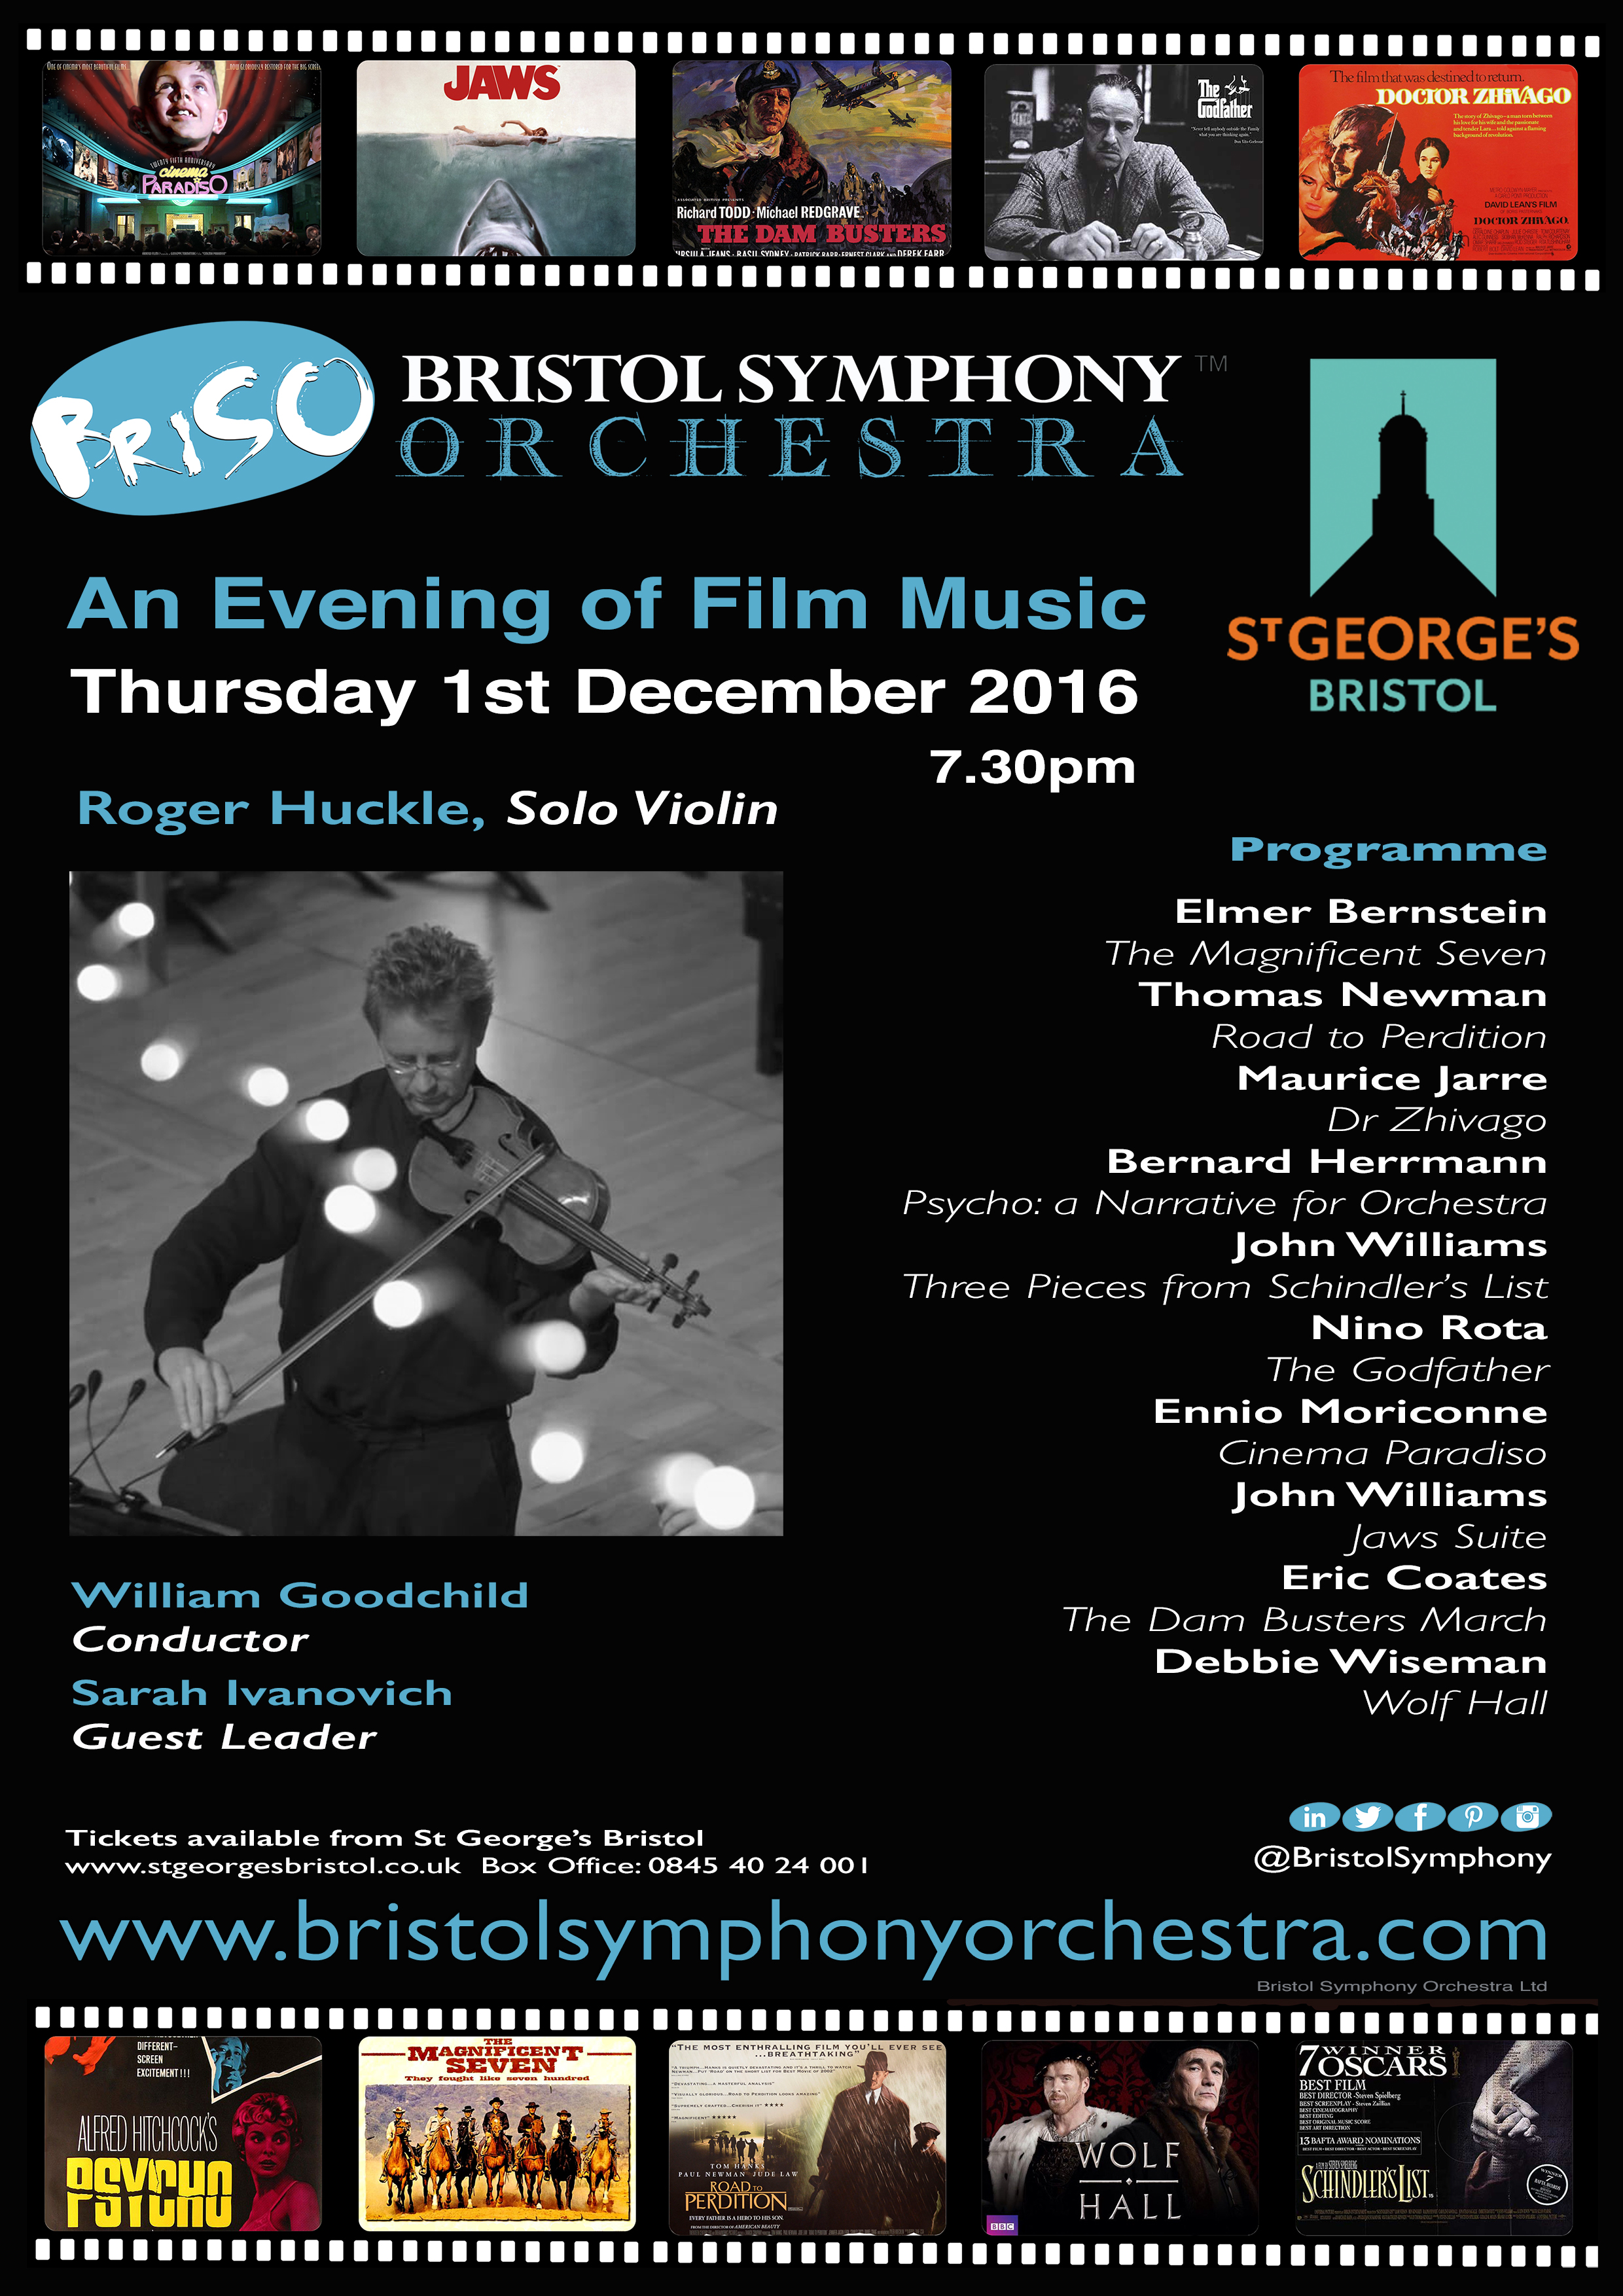 Bristol Symphony Concert